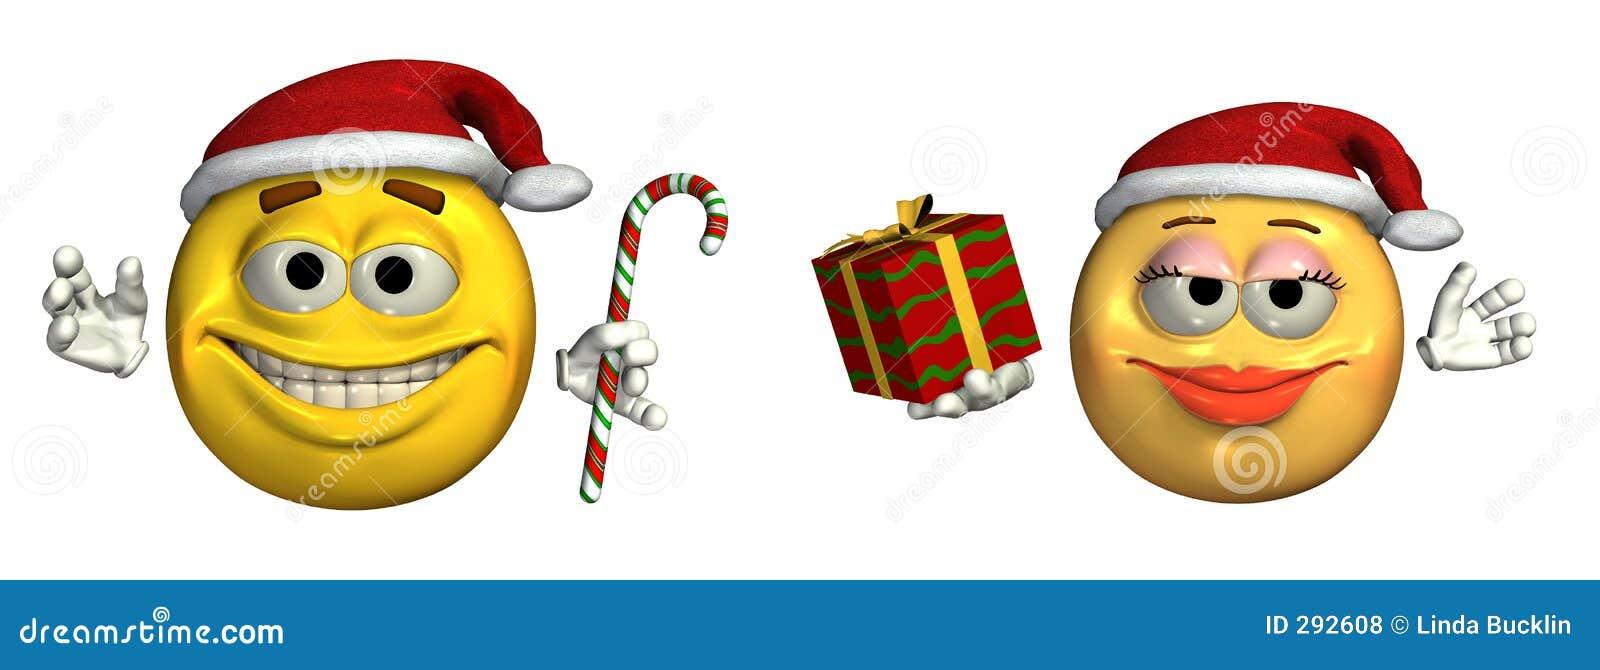 Grote Kerstmis Emoticons - omvat het knippen weg